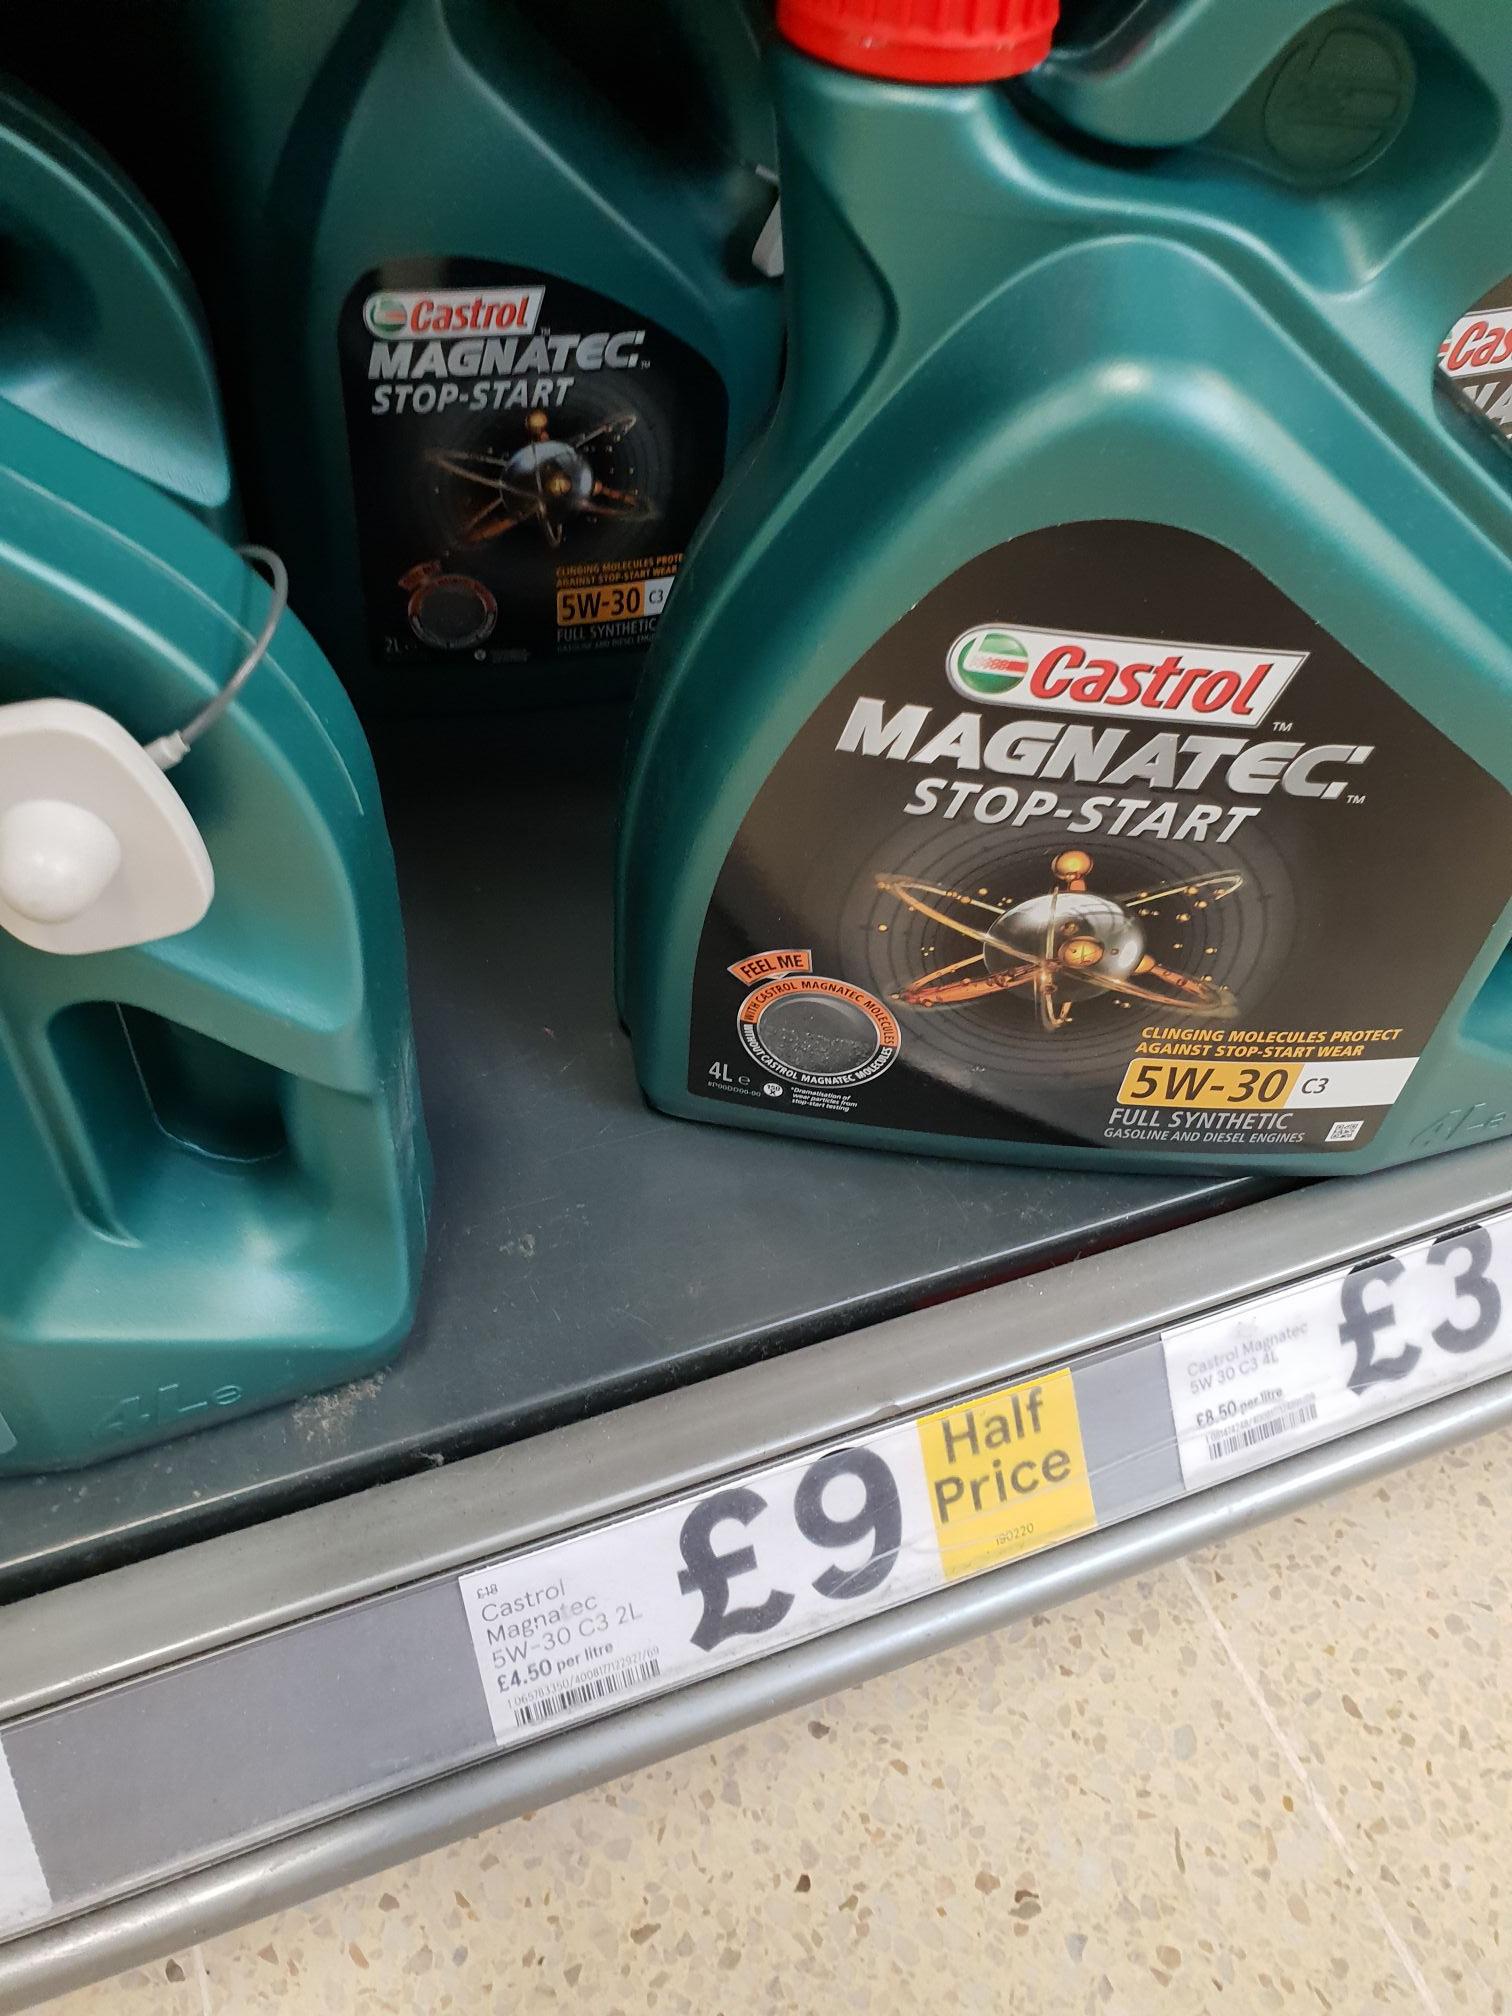 Castrol Magnatec Stop-Start 5W-30 C3 2L Oil was £18 now £9 @ Tesco